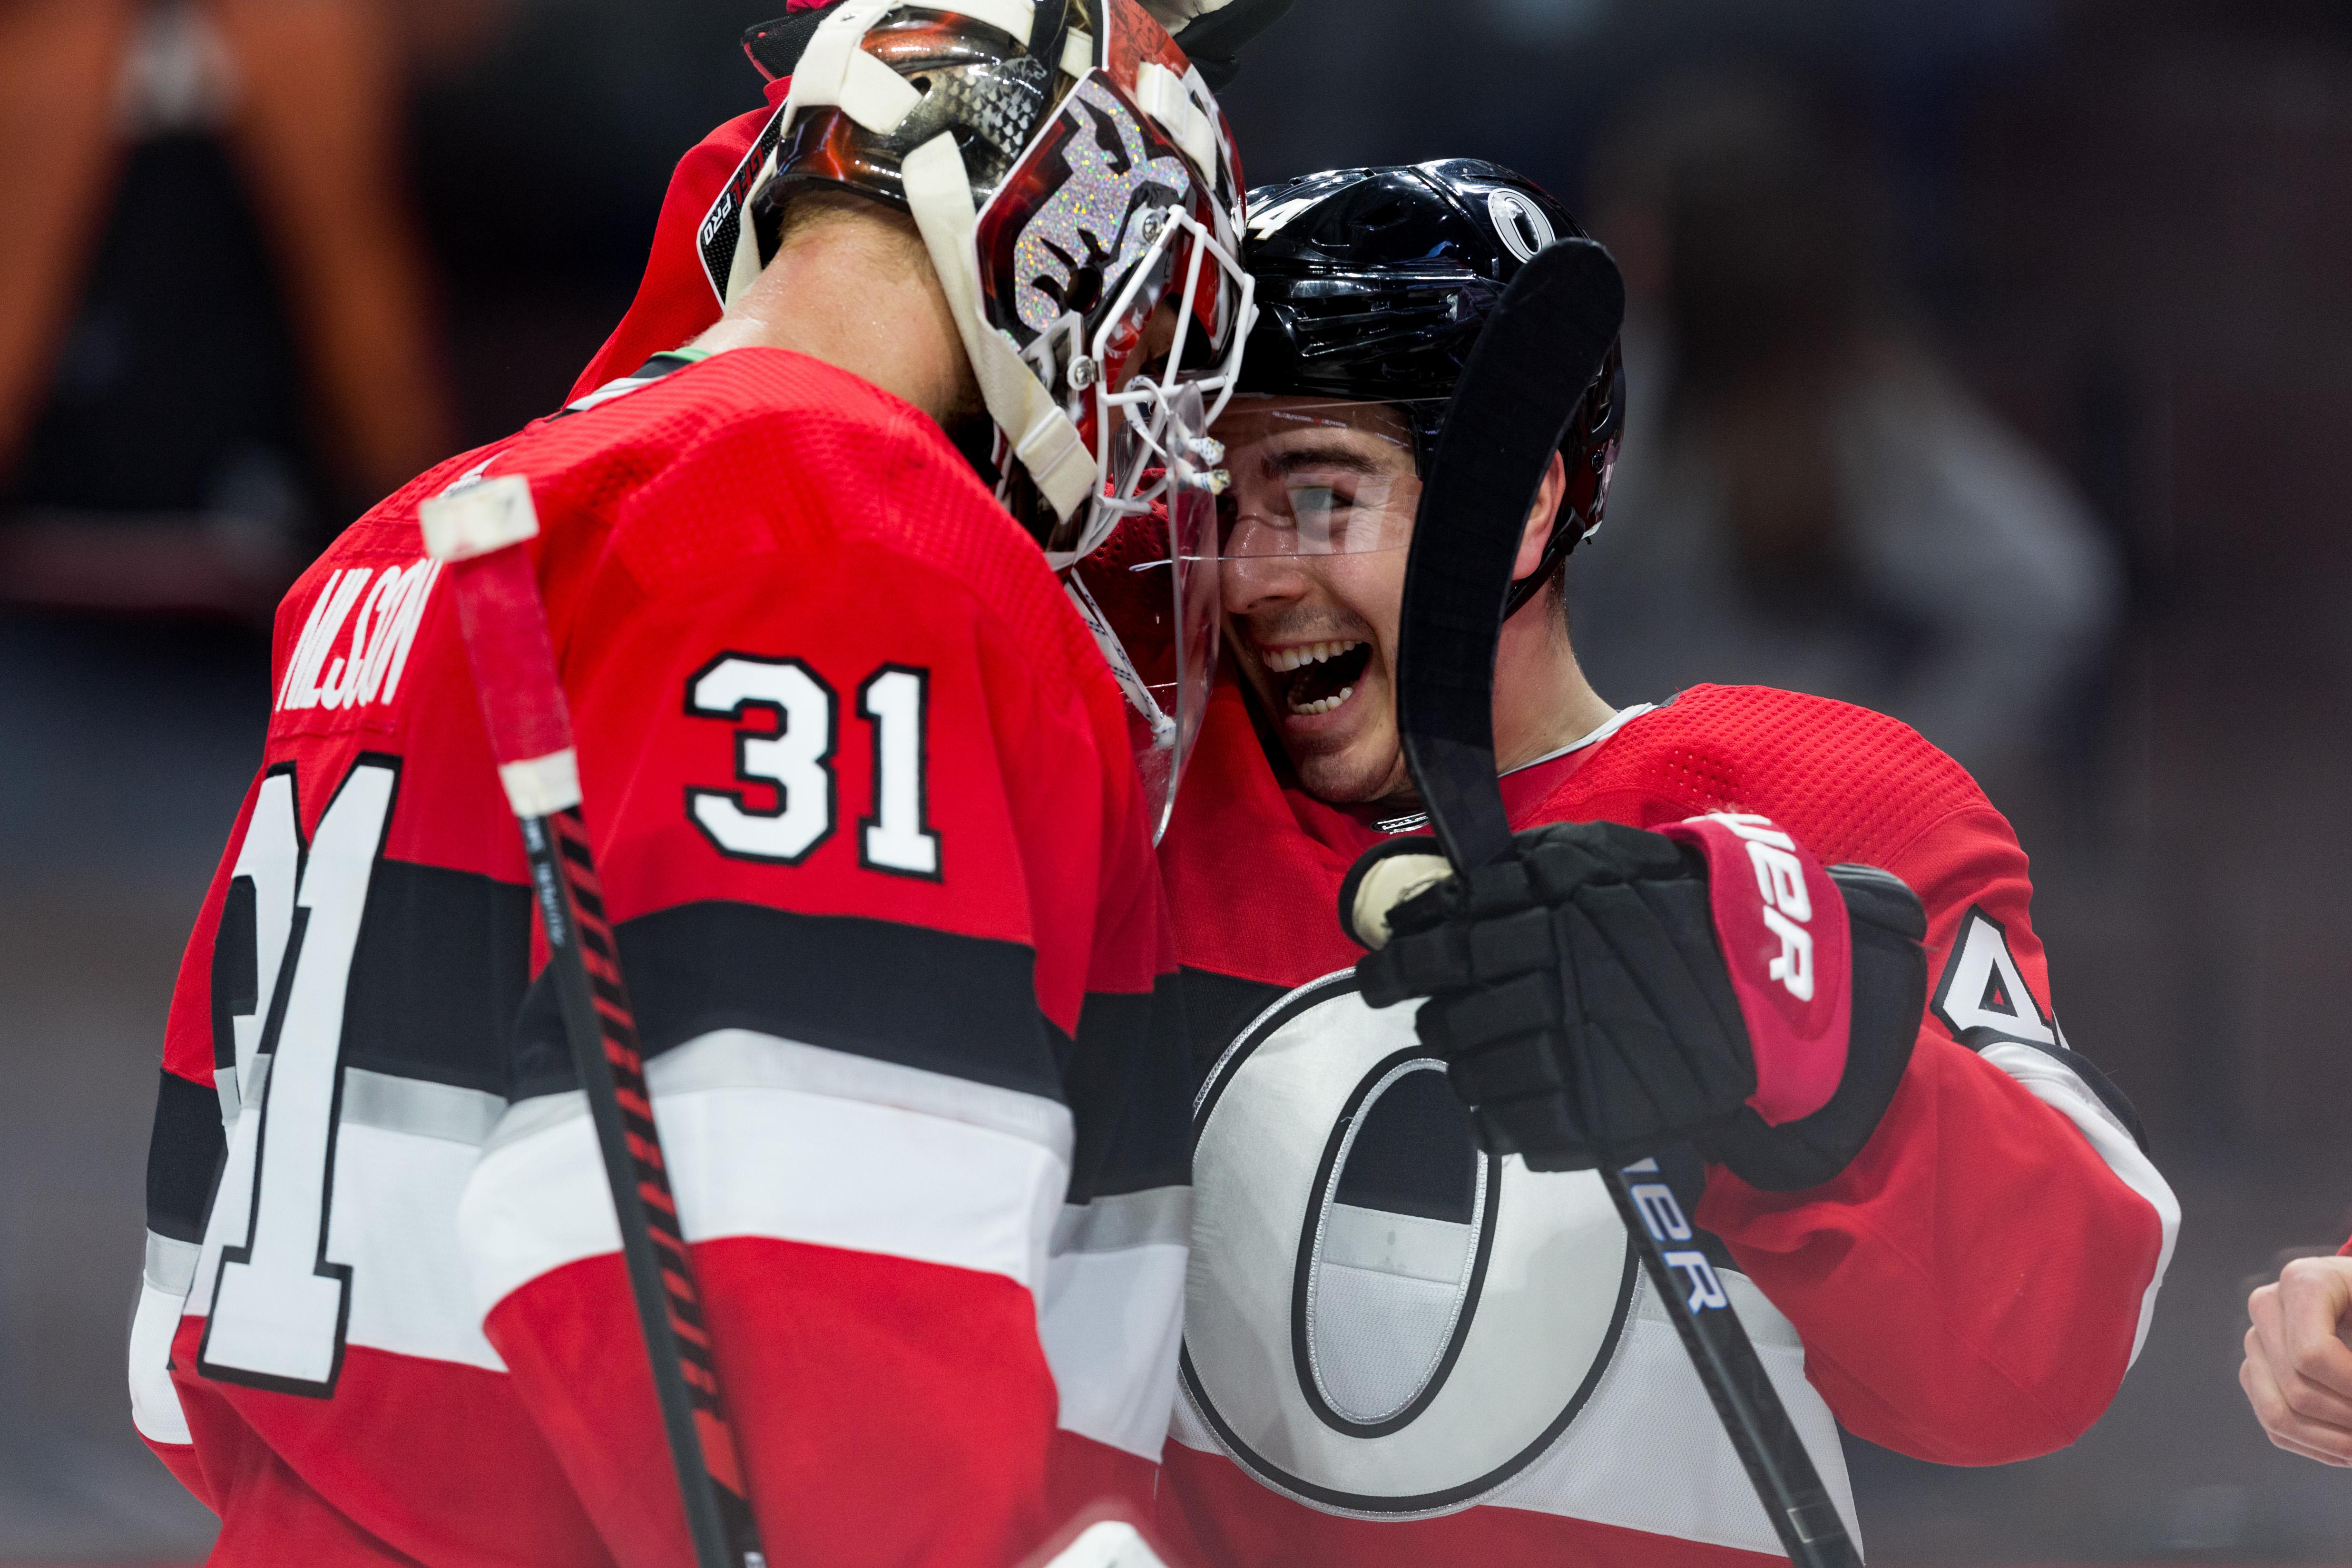 NHL: FEB 07 Ducks at Senators